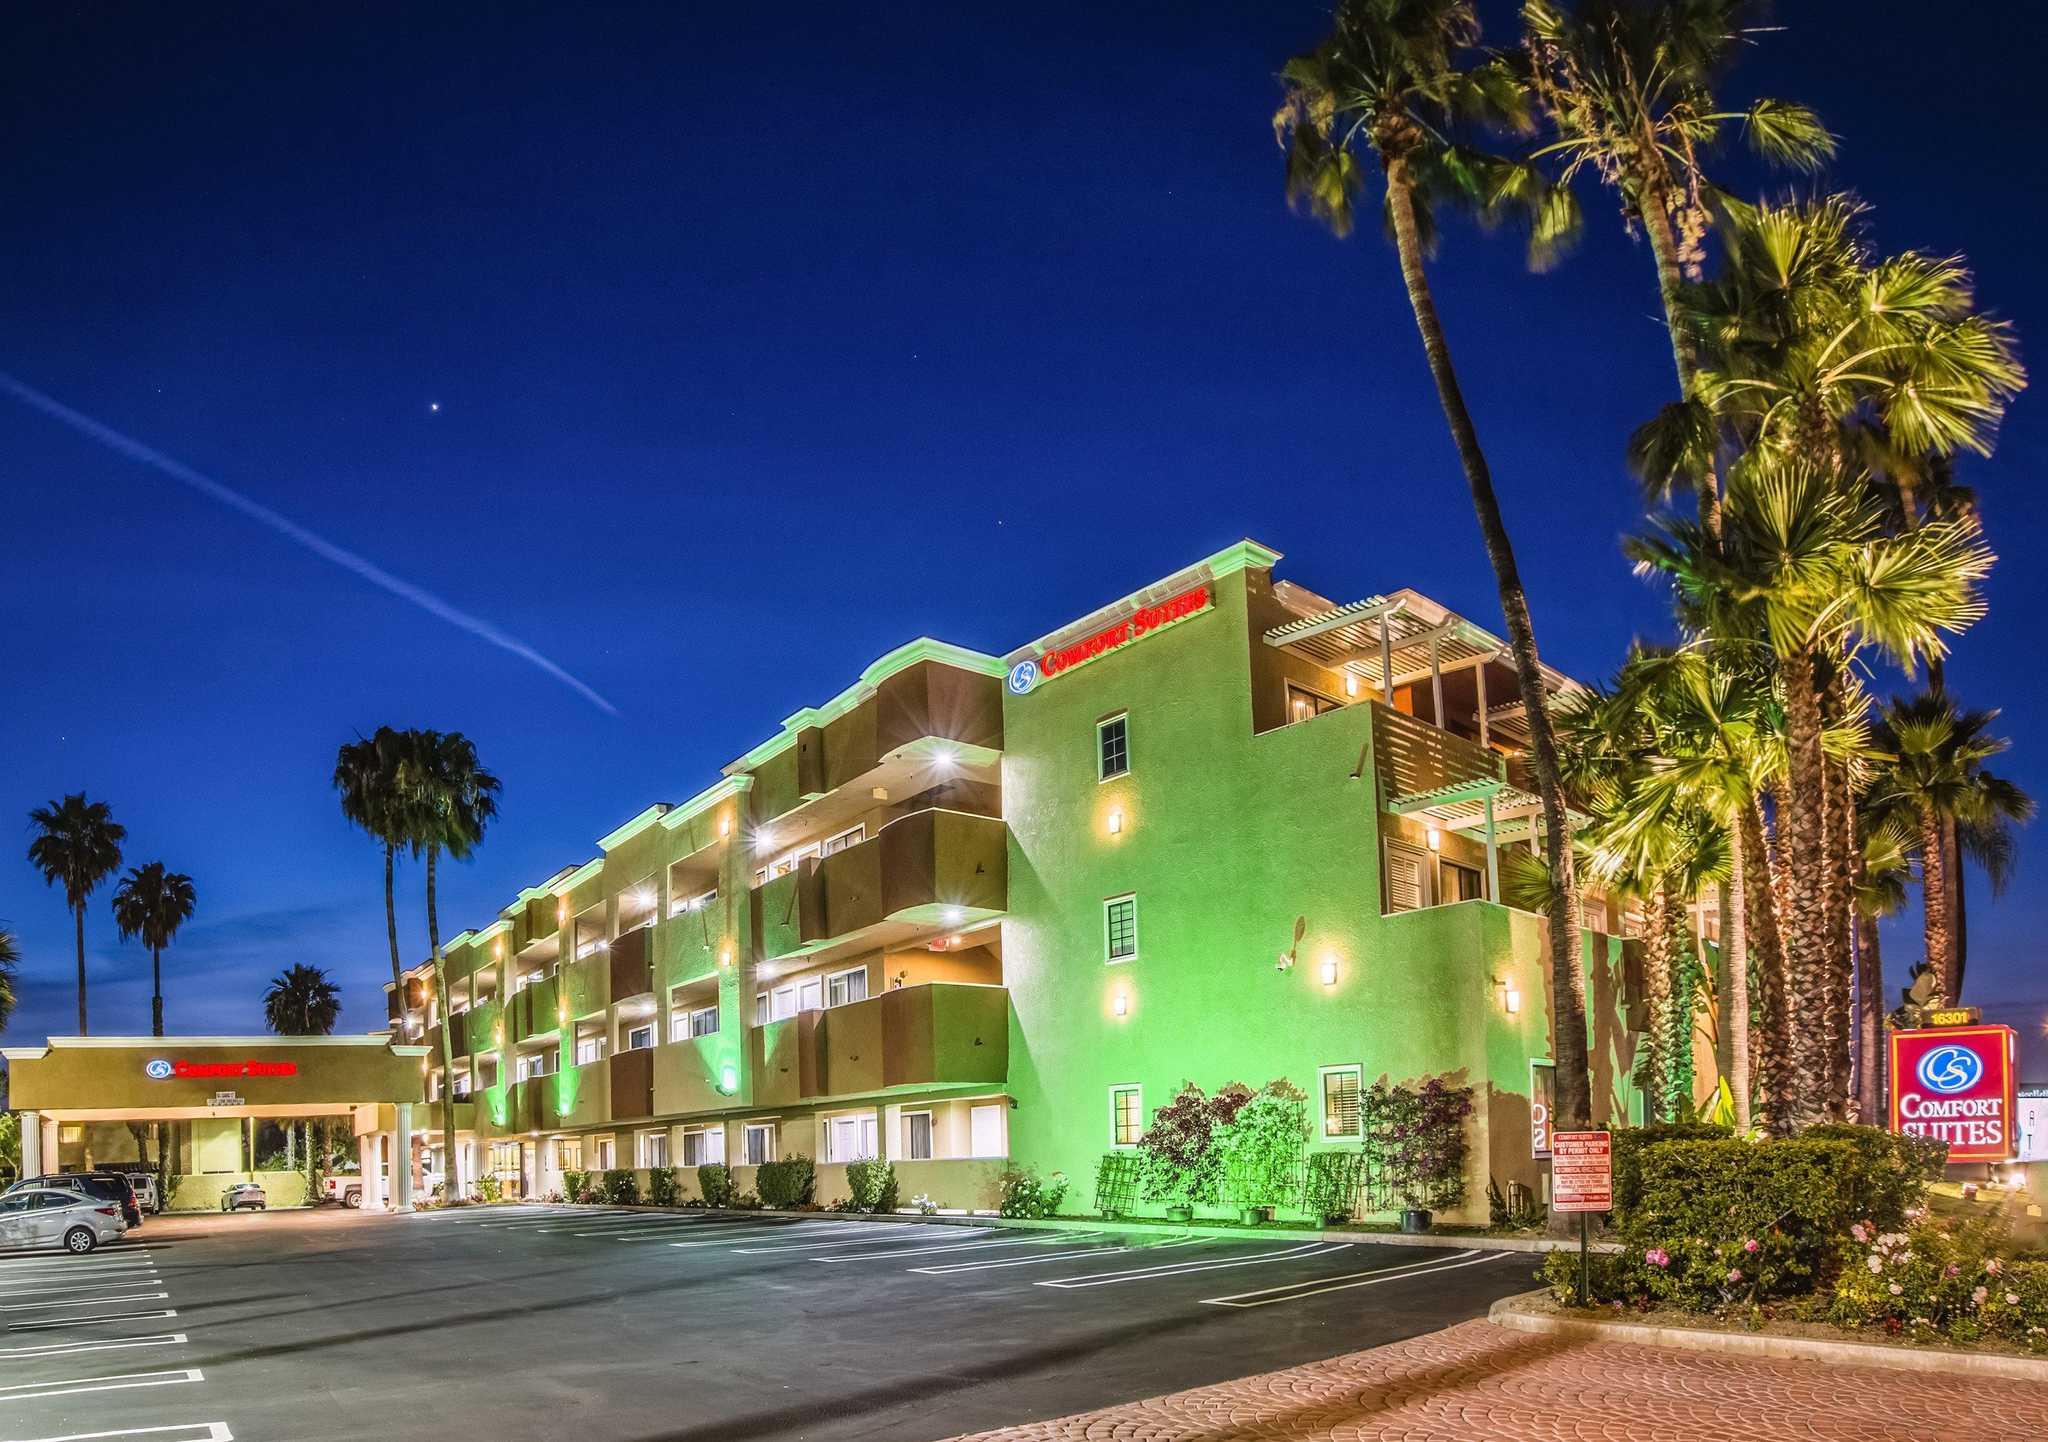 Comfort Suites Huntington Beach image 0